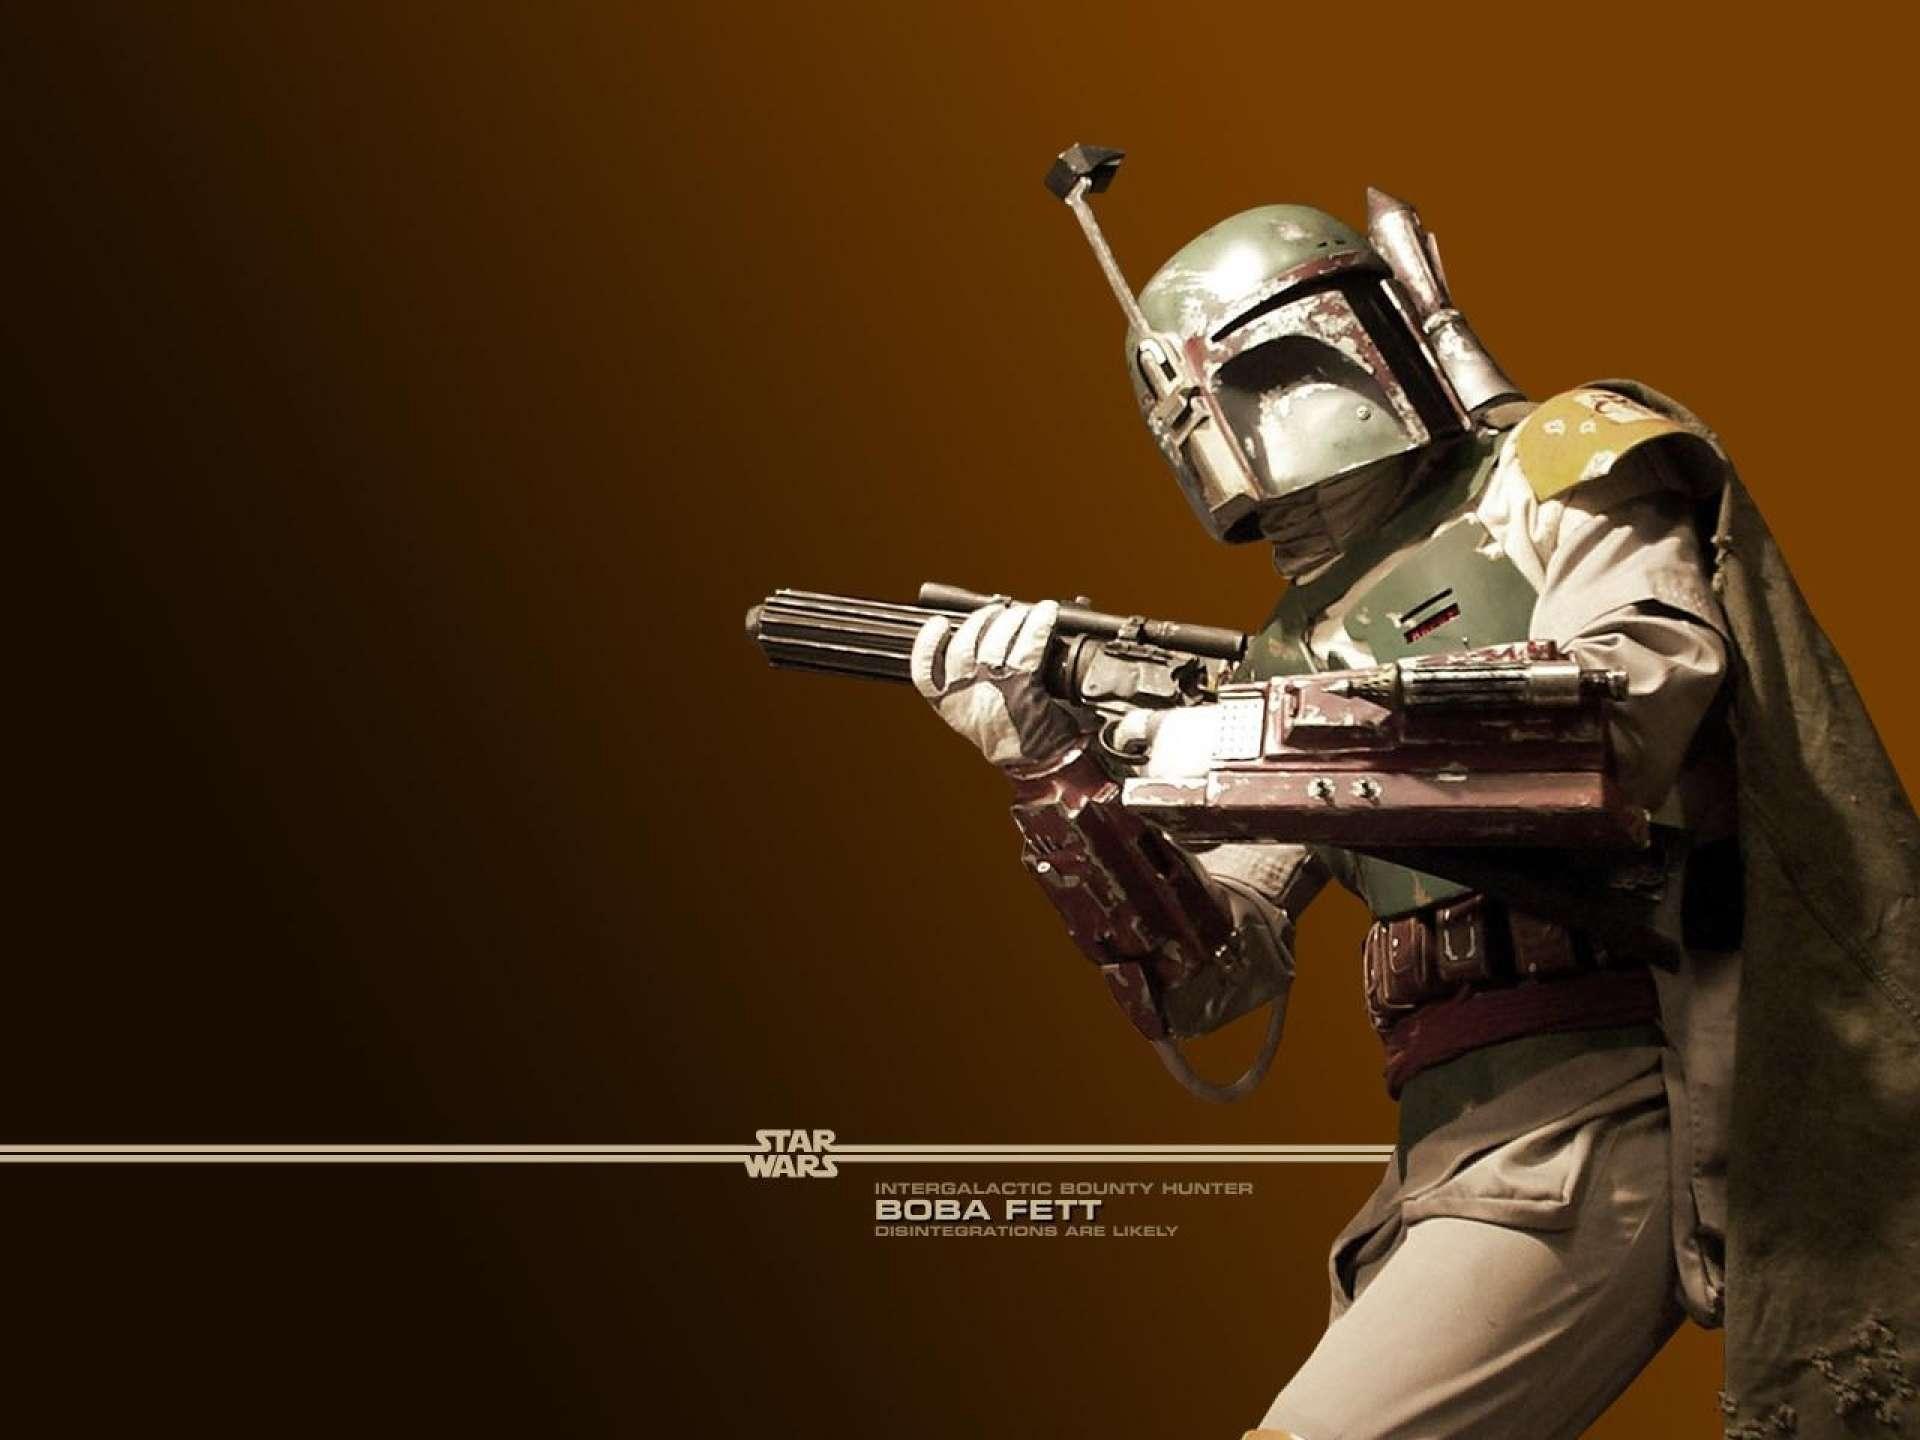 Star Wars Wallpaper 181